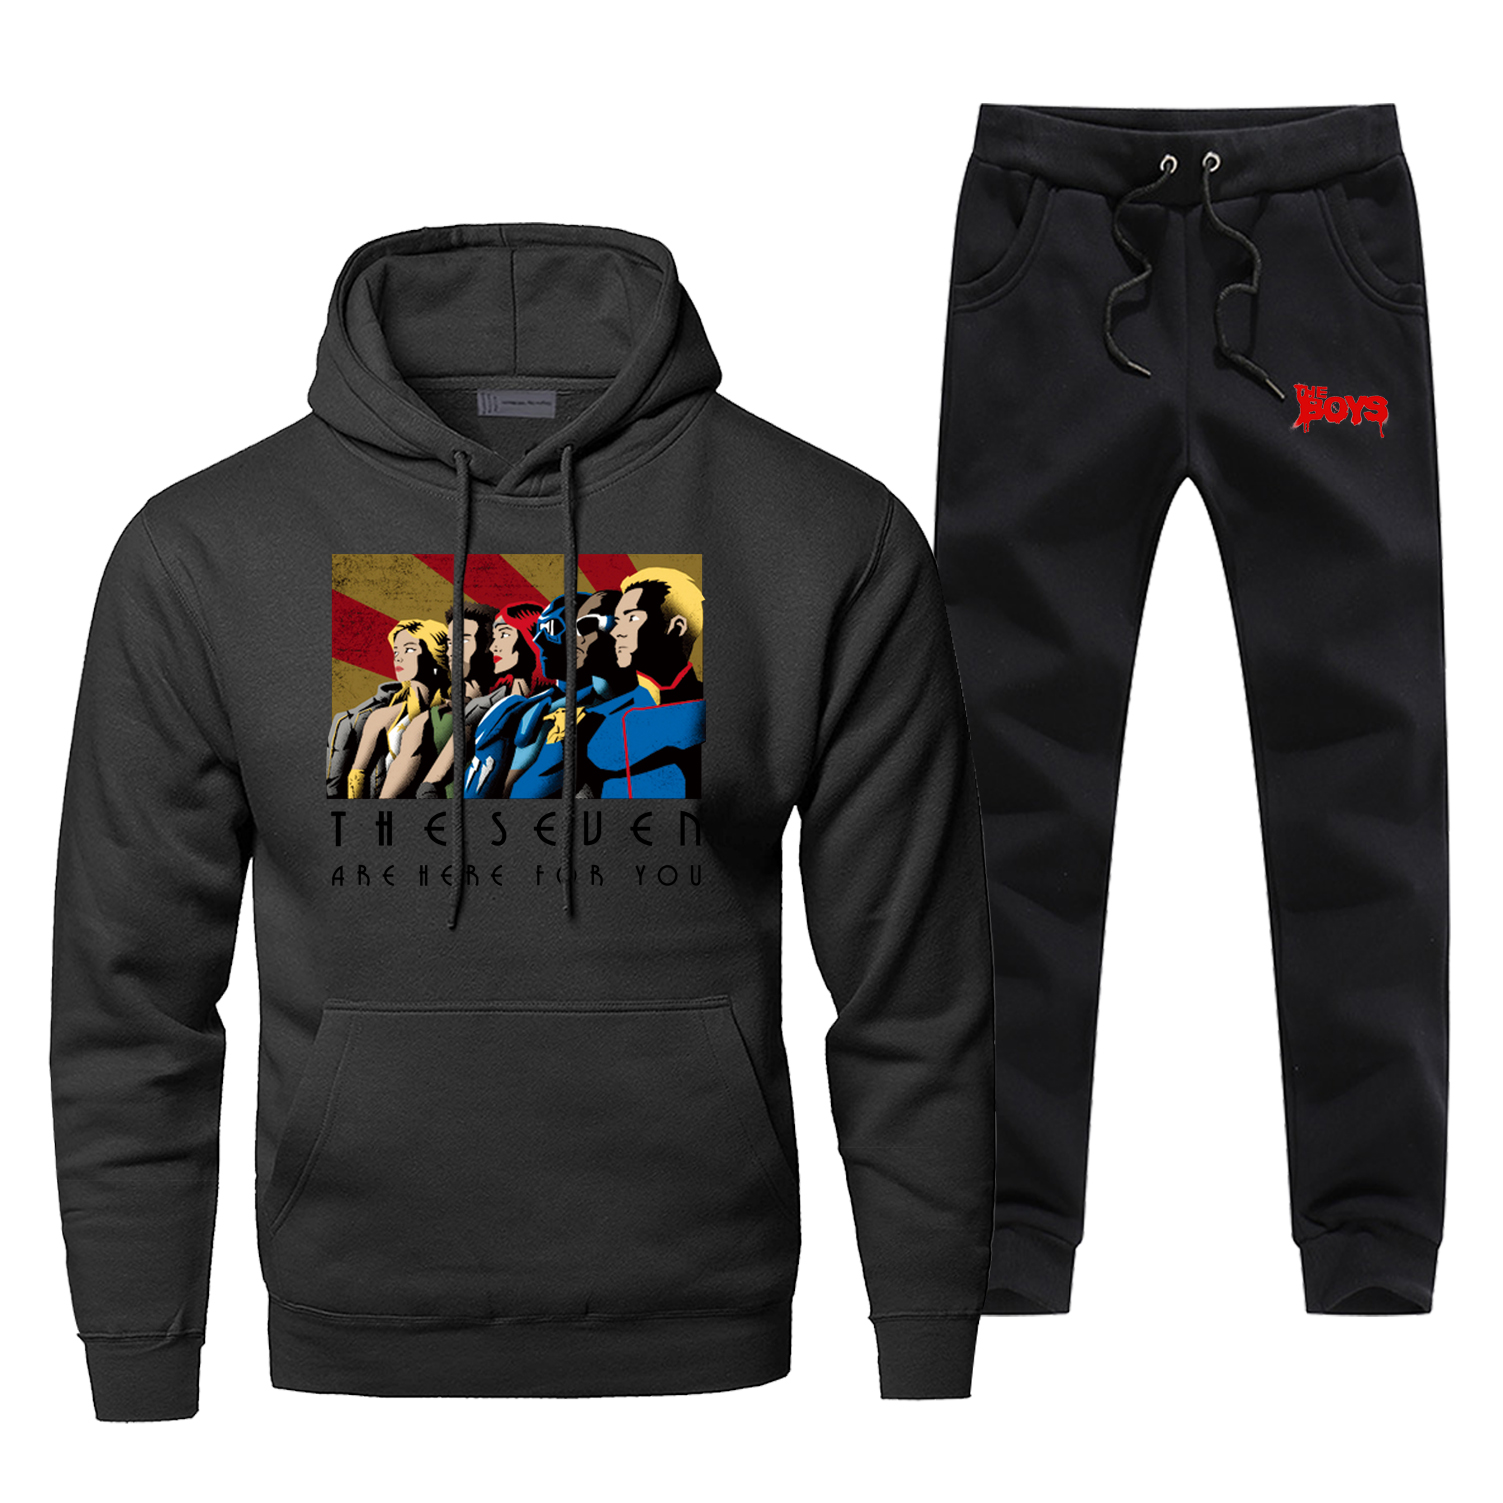 The Boys The Seuen Arehere For You Anime Print Hoodies Pants 2pcs Sets Men Fashion Sweatshirt Winter Fleece Harajuku Streetwear